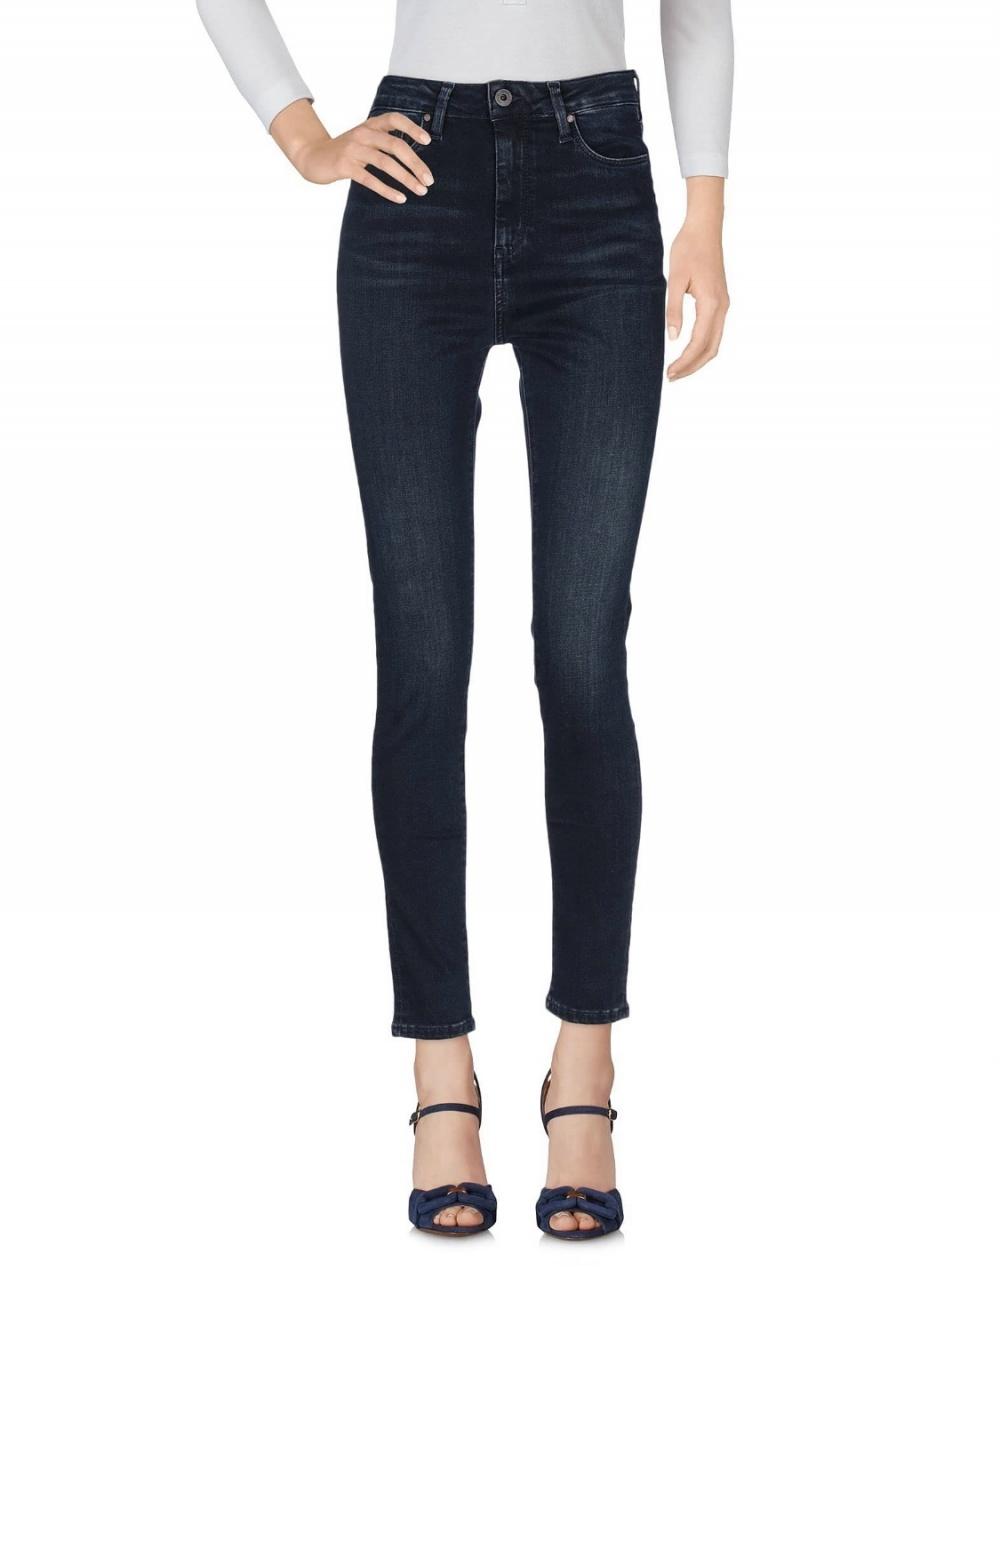 Джинсы Pepe jeans, 25 р-р